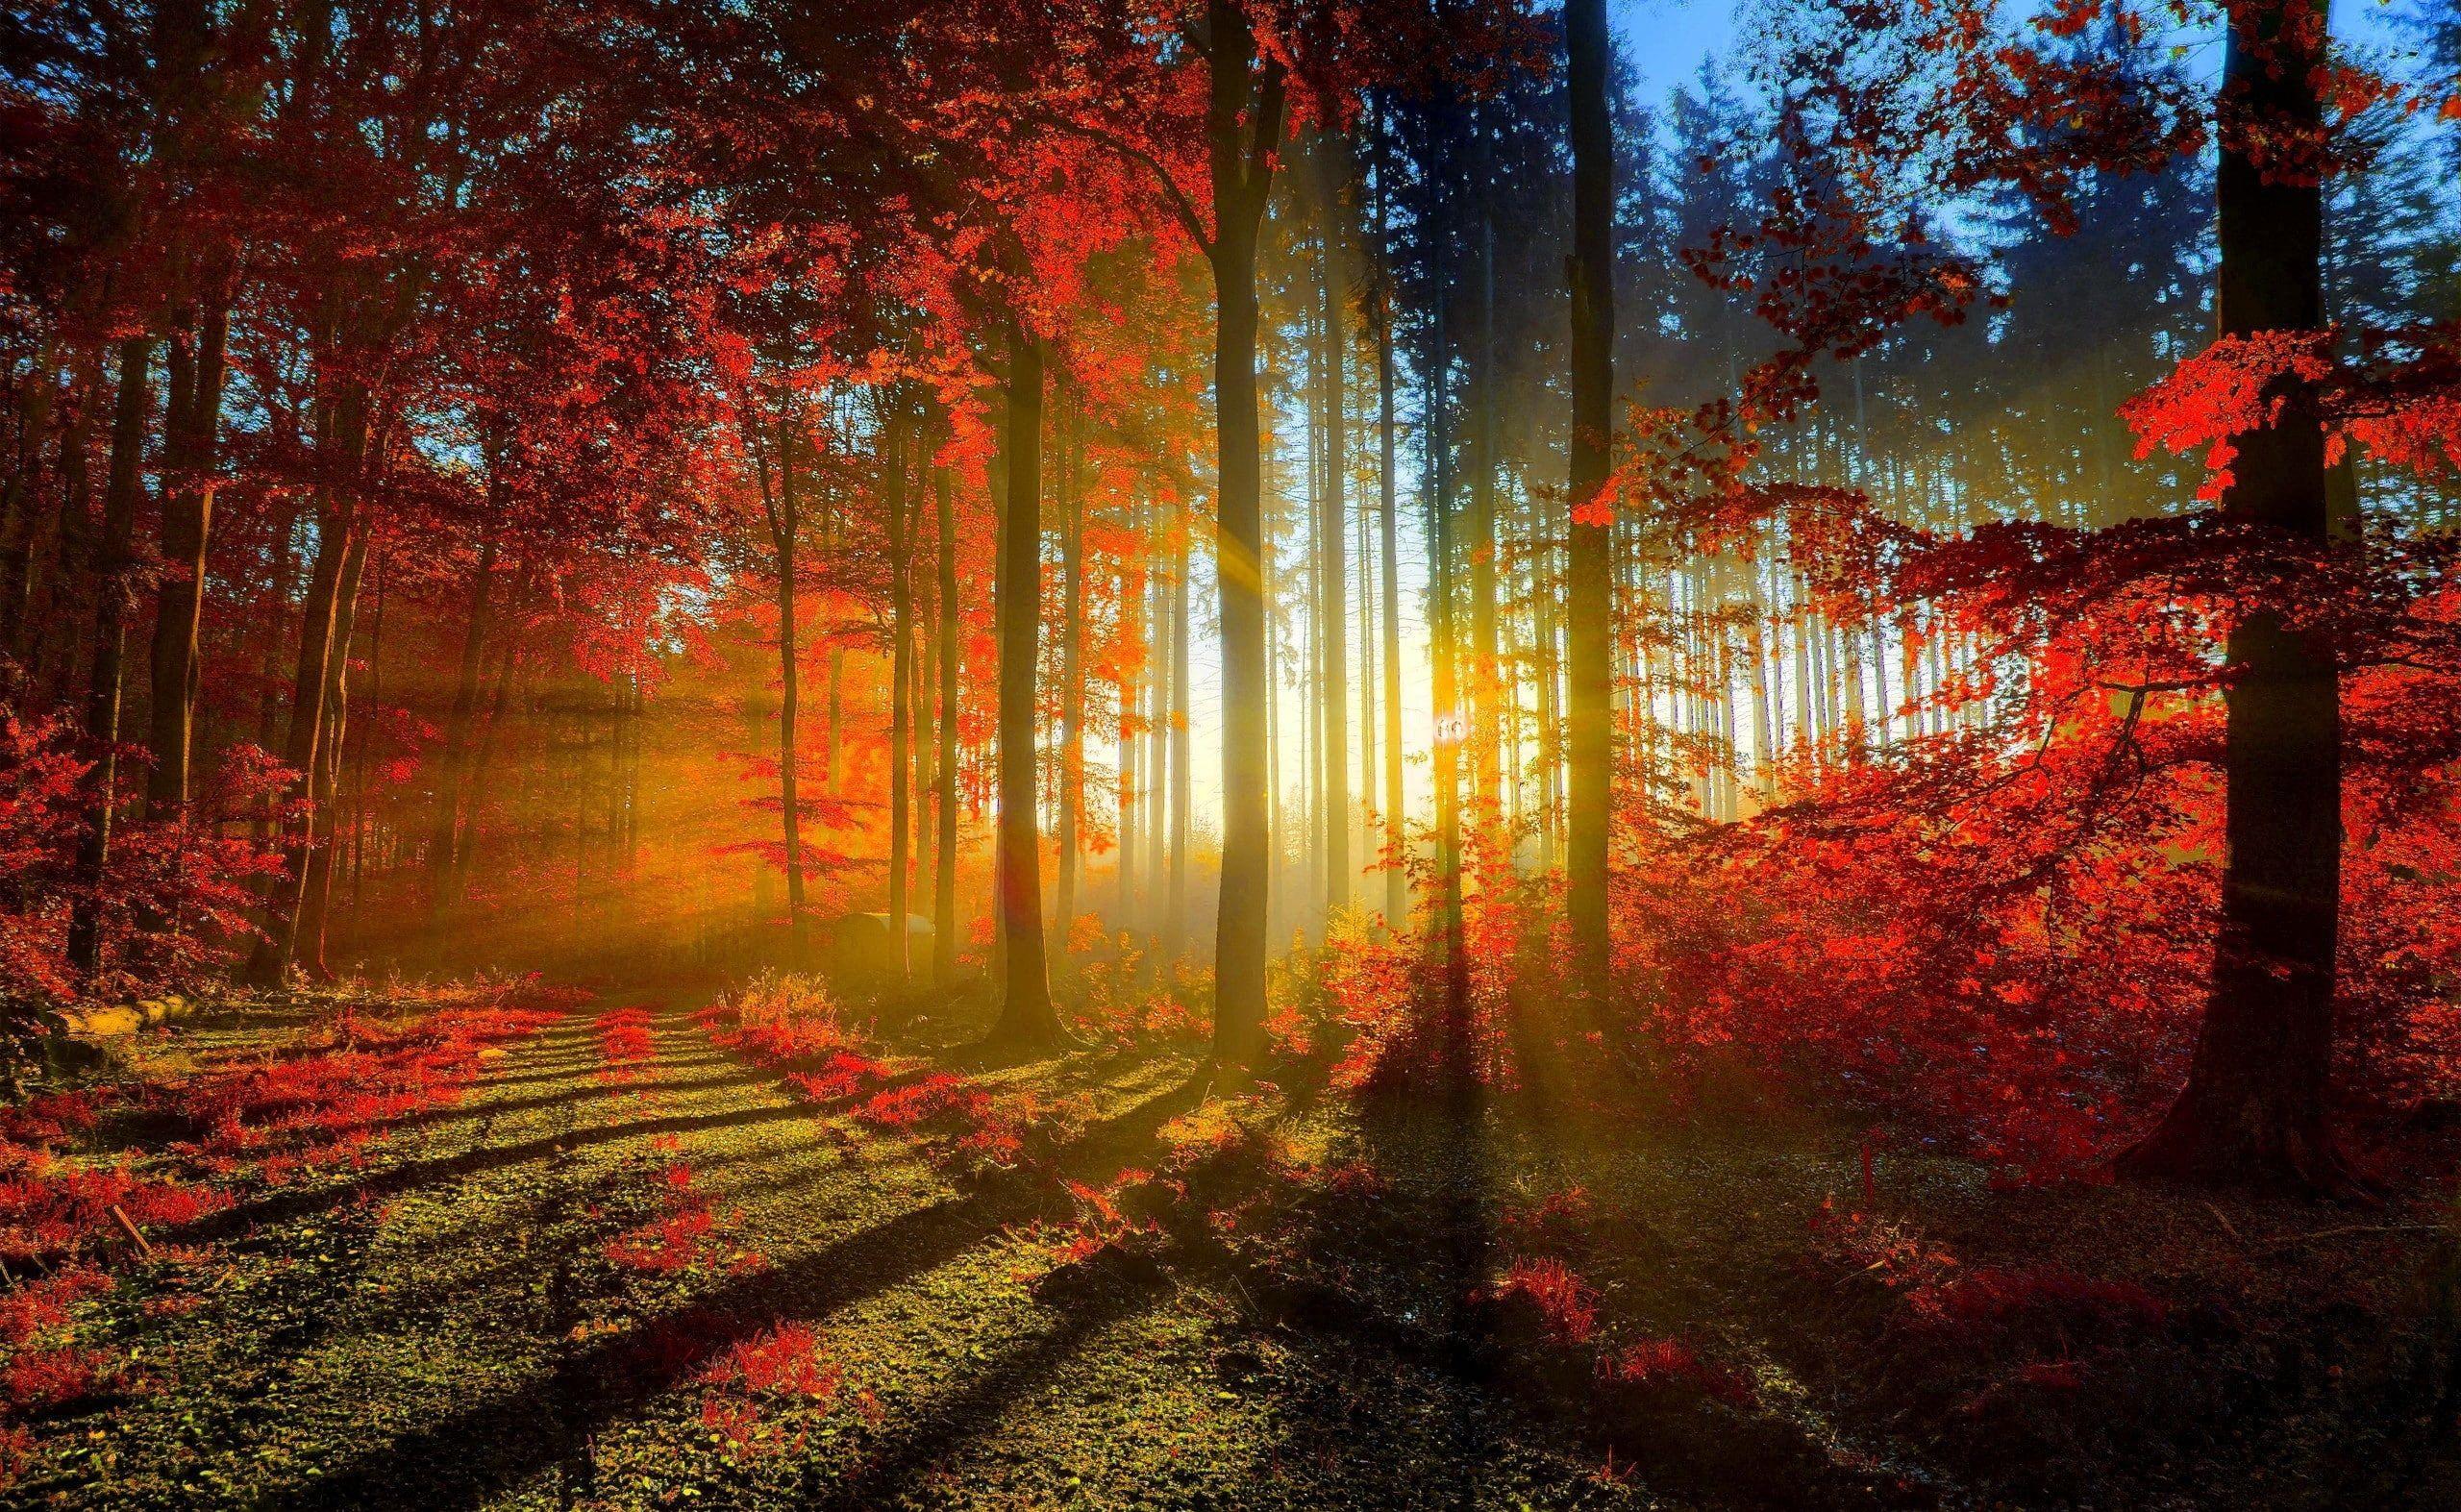 Red Forest Photography Of Autumn Seasons Autumn Nature Beautiful Autumn Trees Forest Fall Path Sun Rays Sunra Abstraktnyj Pejzazh Pejzazhi Lesnye Oboi Wallpaper rays of light trees autumn